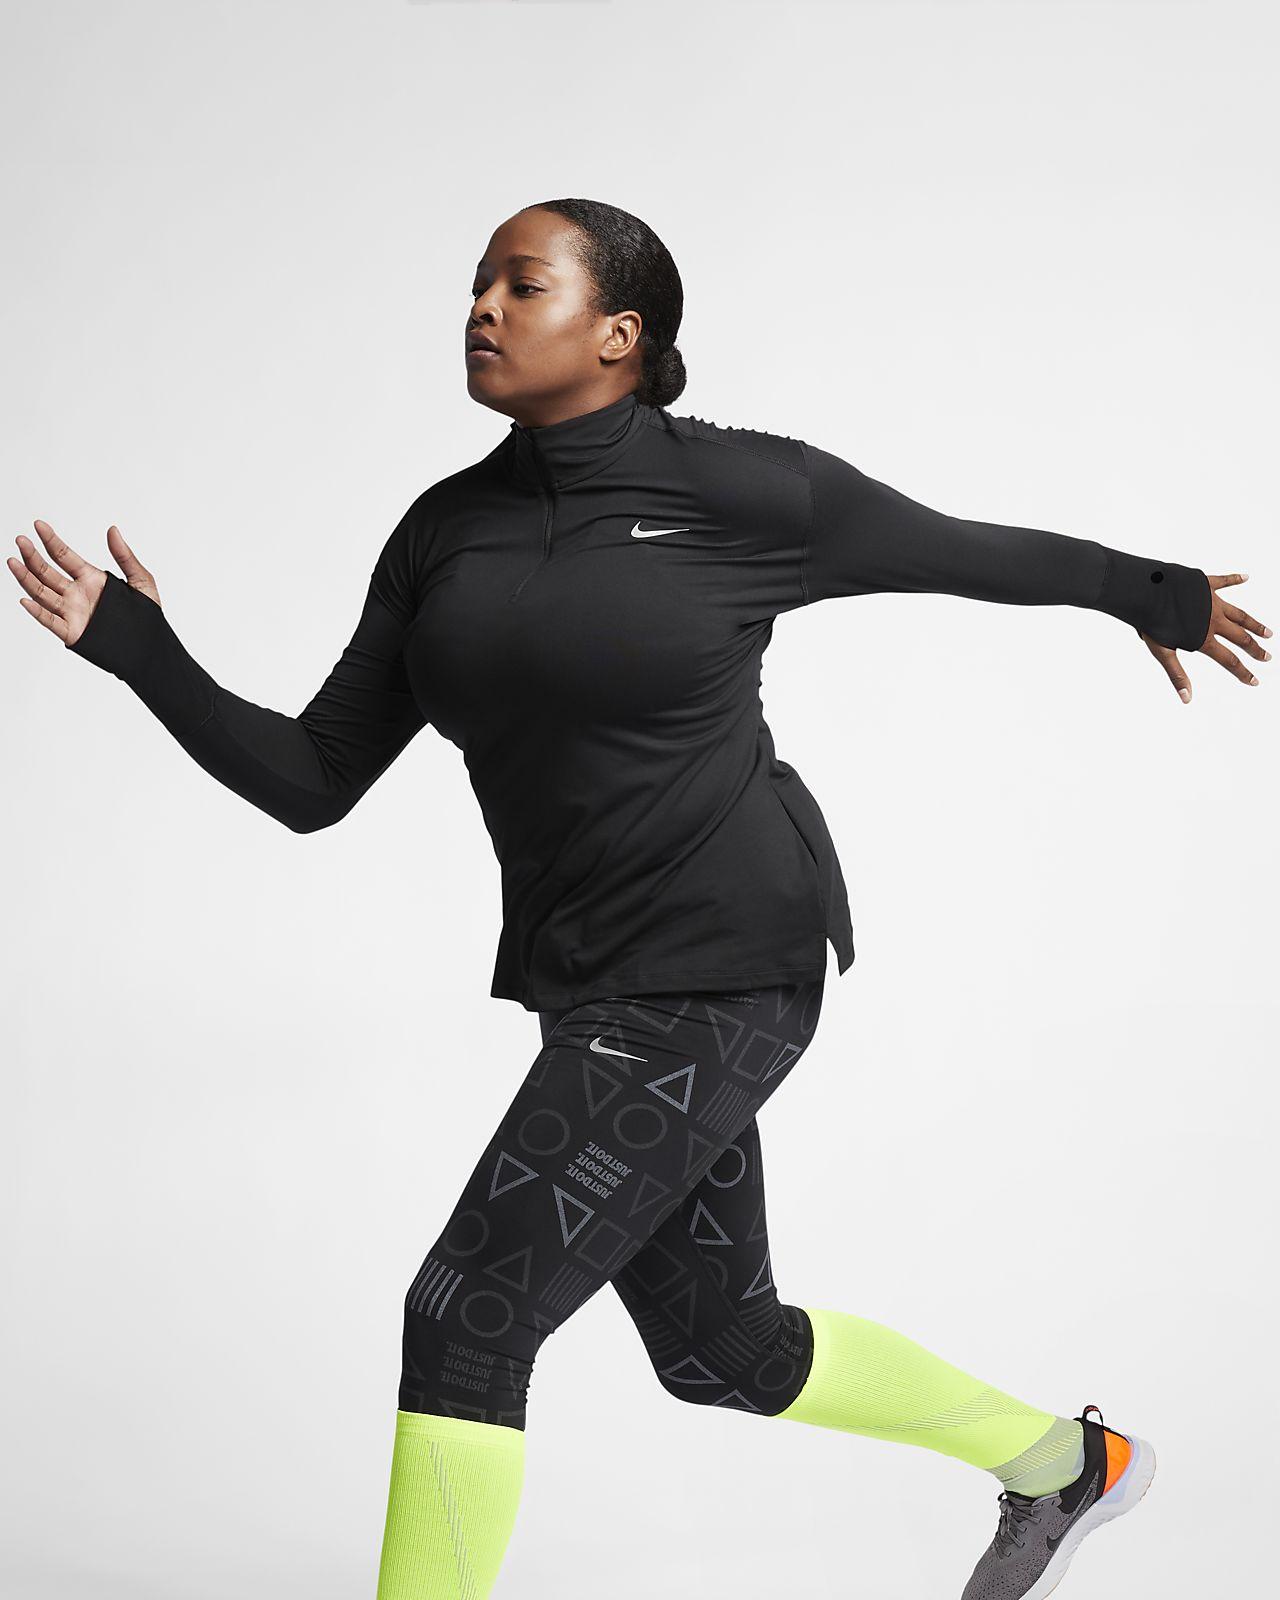 Nike Damen-Laufoberteil (große Größe)